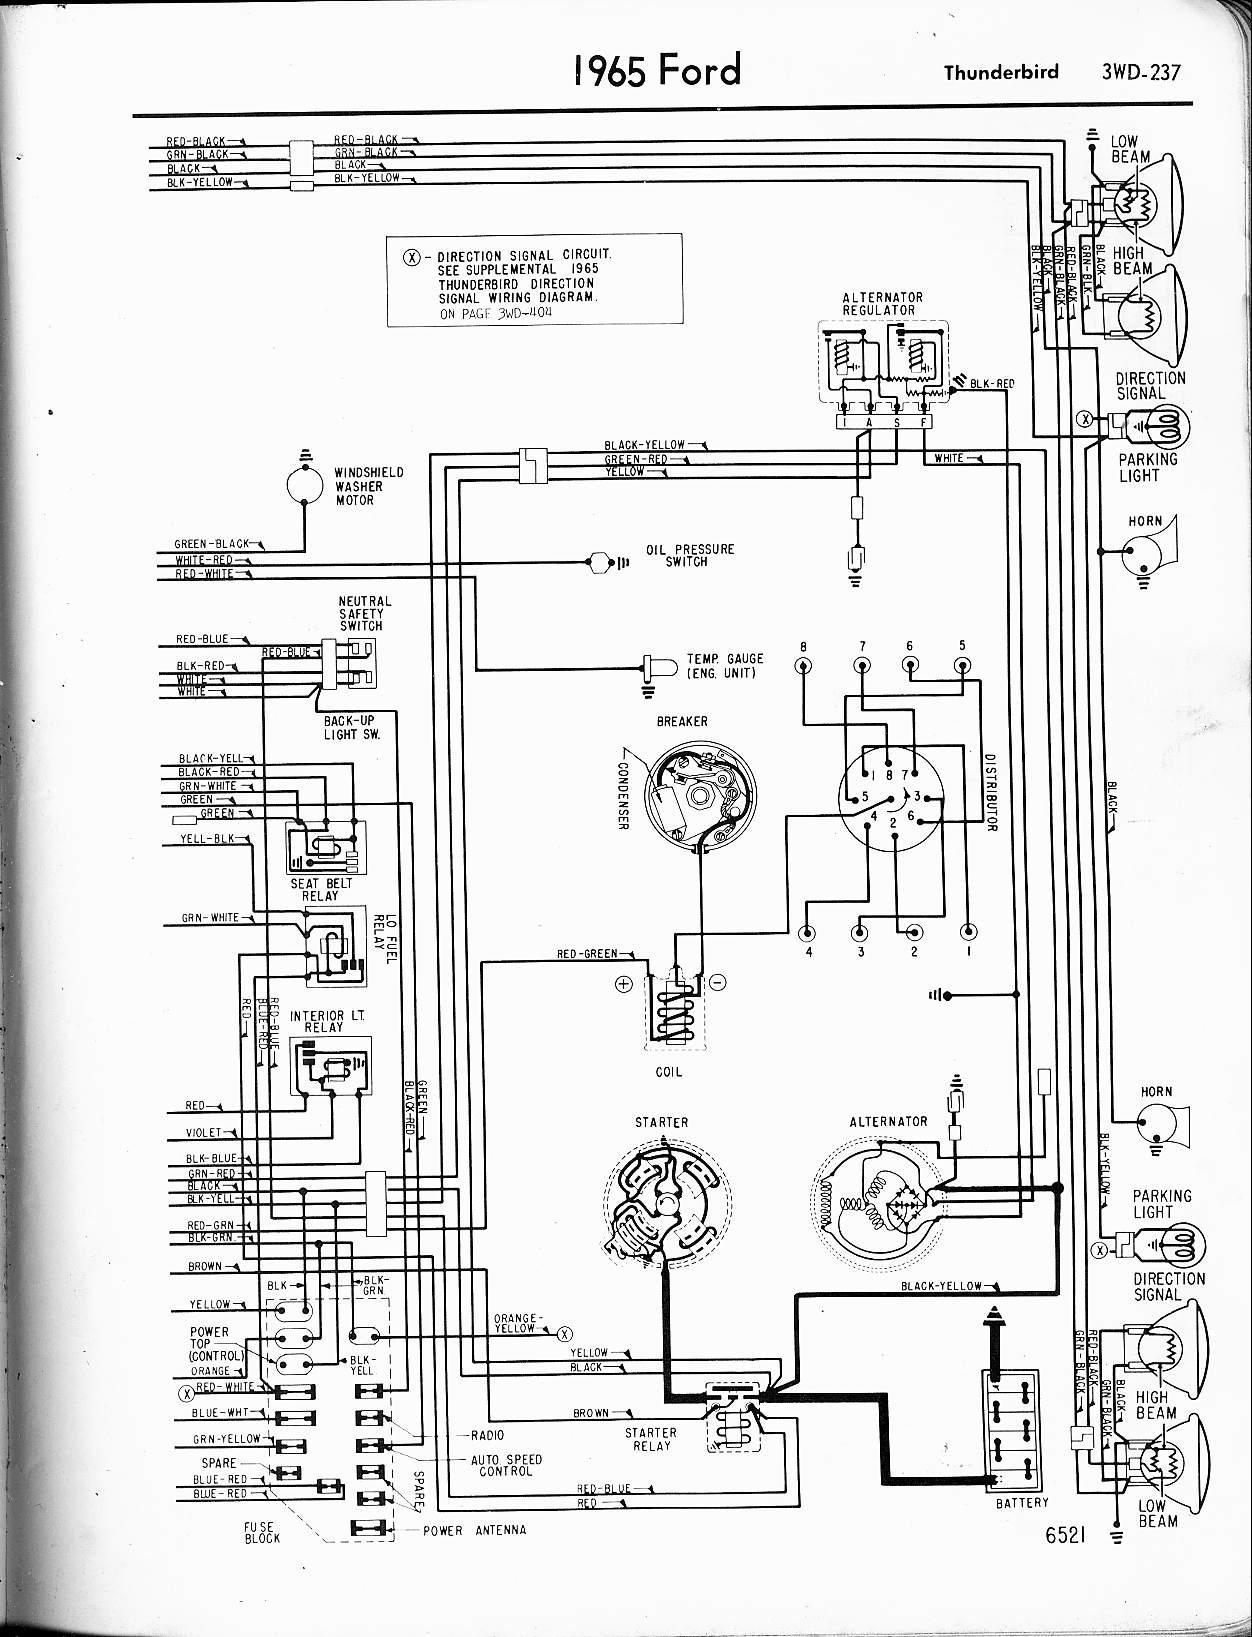 1965 ford t bird wiring